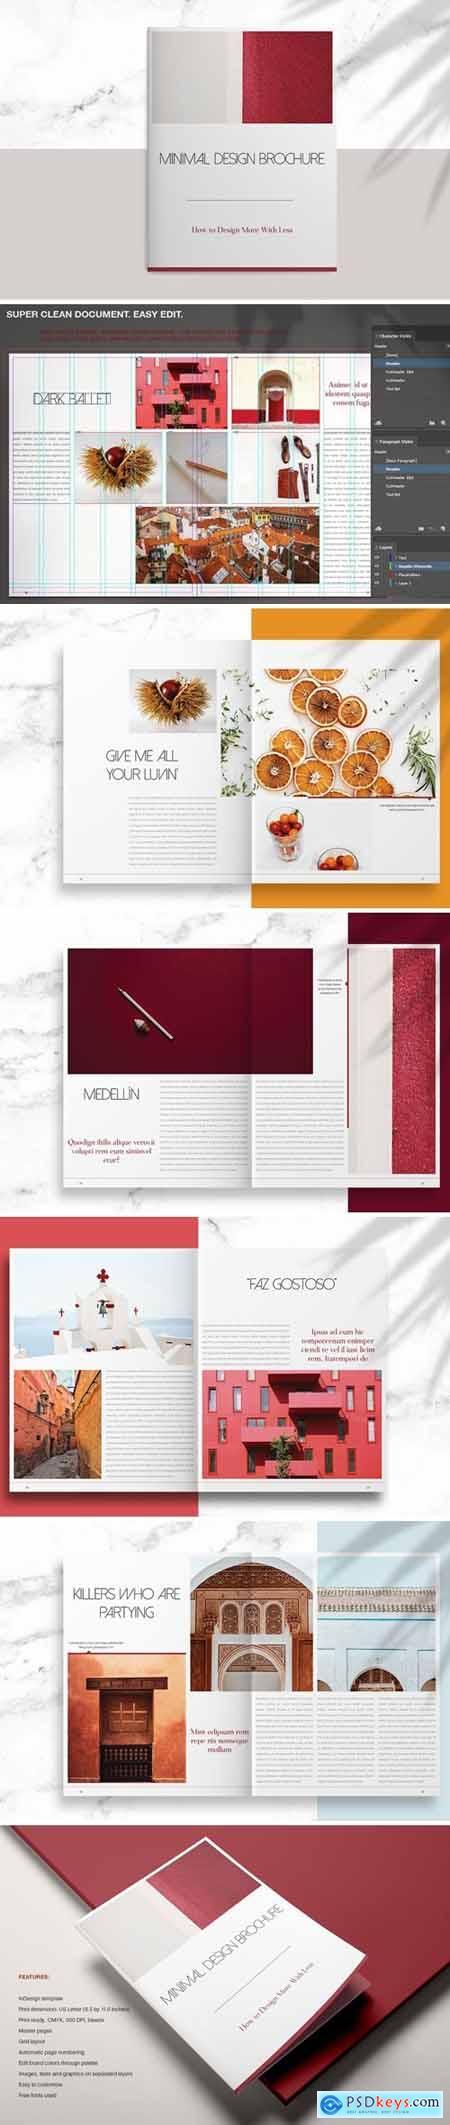 Minimal Design Brochure 3896523